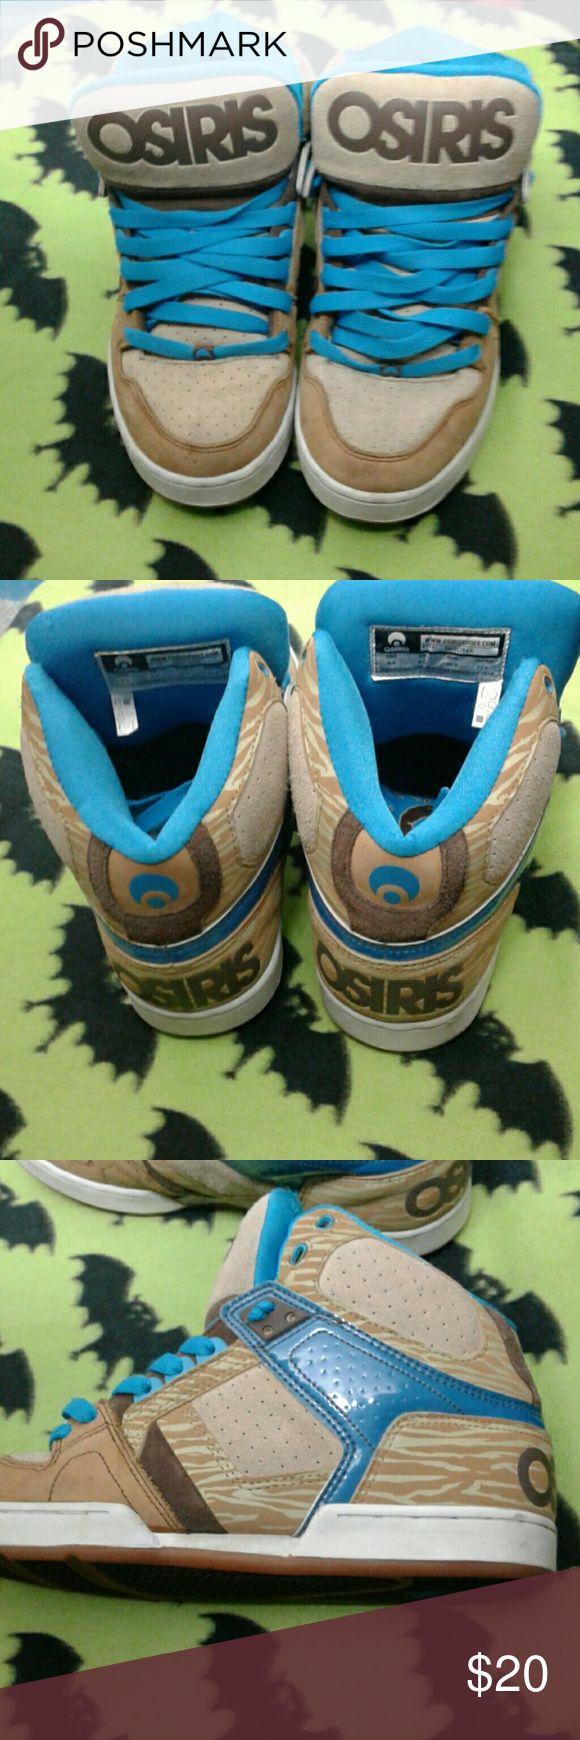 Skate shoes under 30 dollars - Men S Bronx Osiris Skate Shoes Men S Osiris Skate Shoes In The Style Bronx